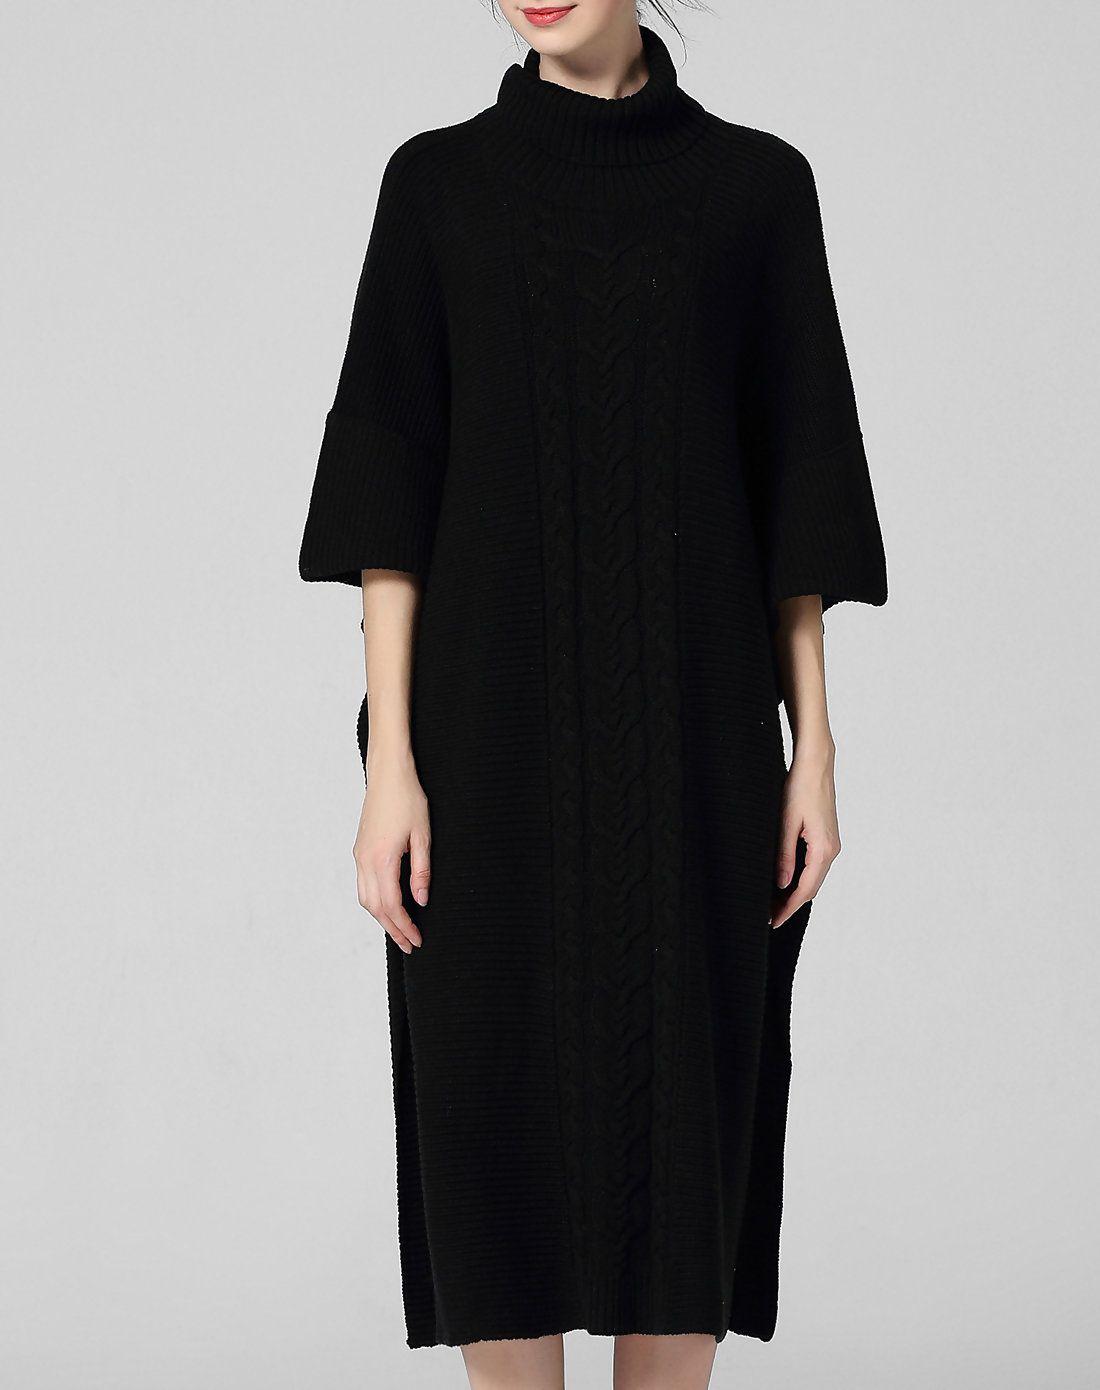 Adorewe vipme sweater dresses wei guo yue black turtleneck half